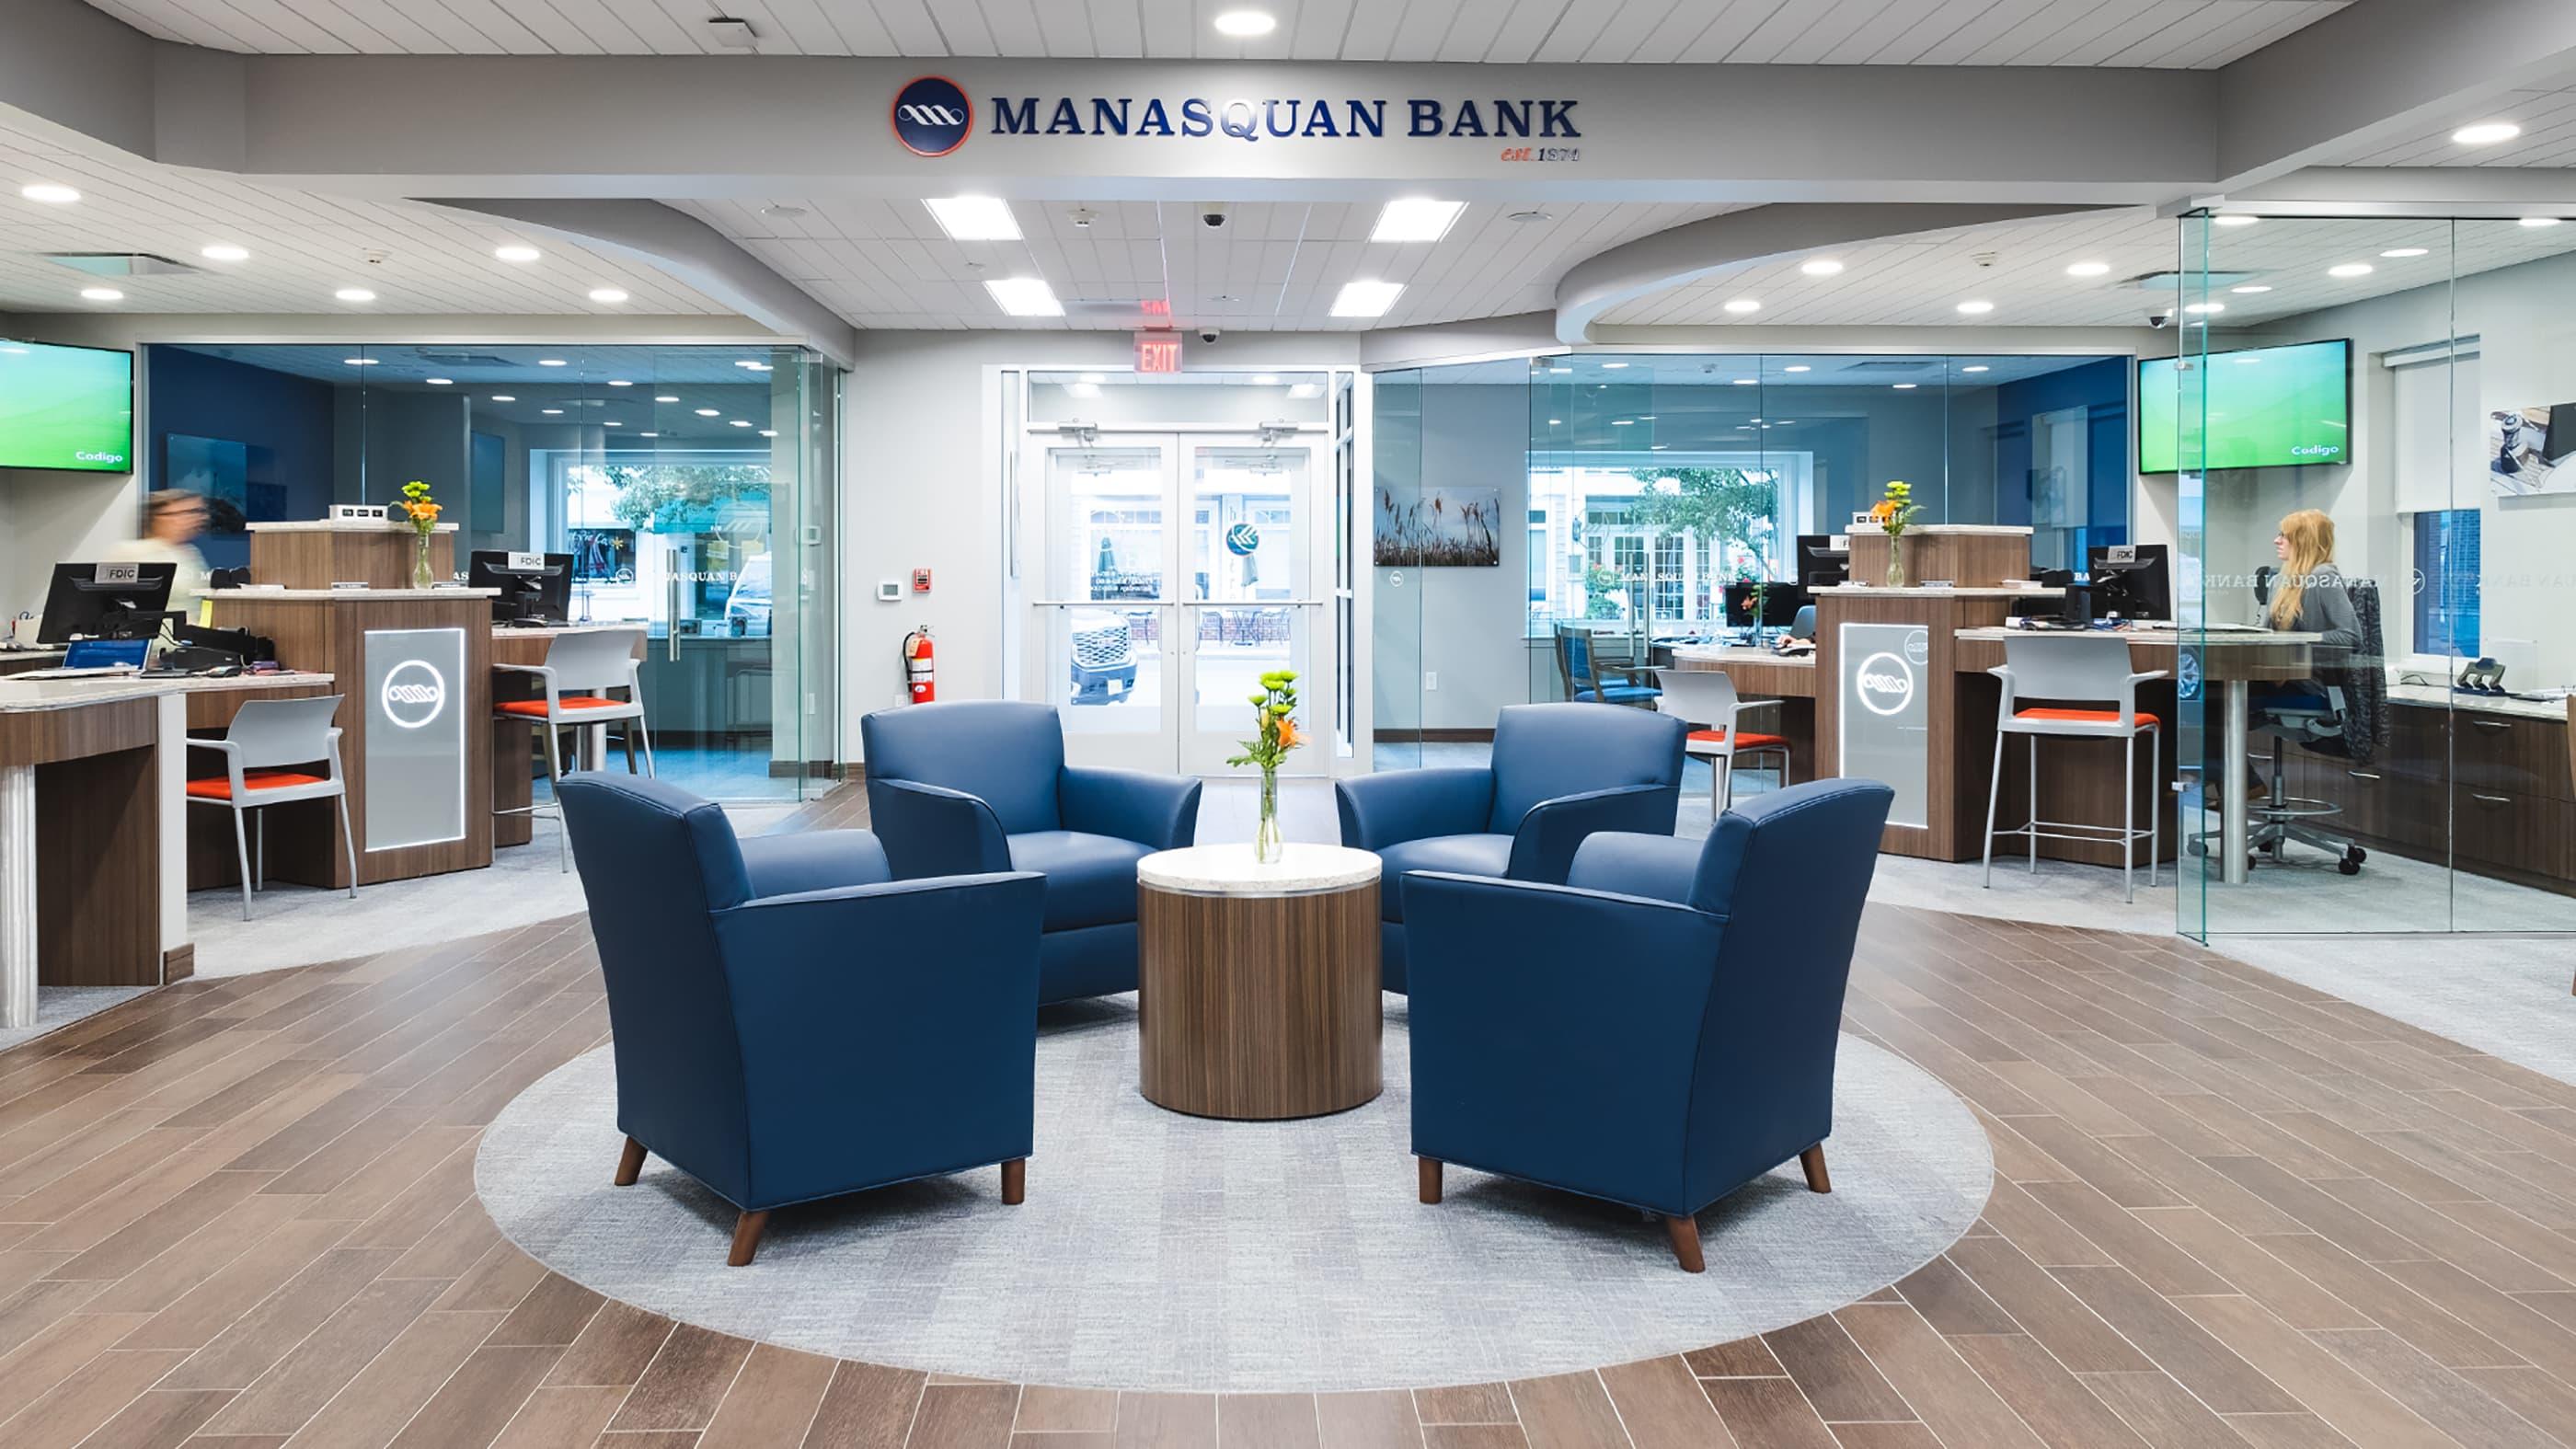 Manasquan Bank Branch Photography